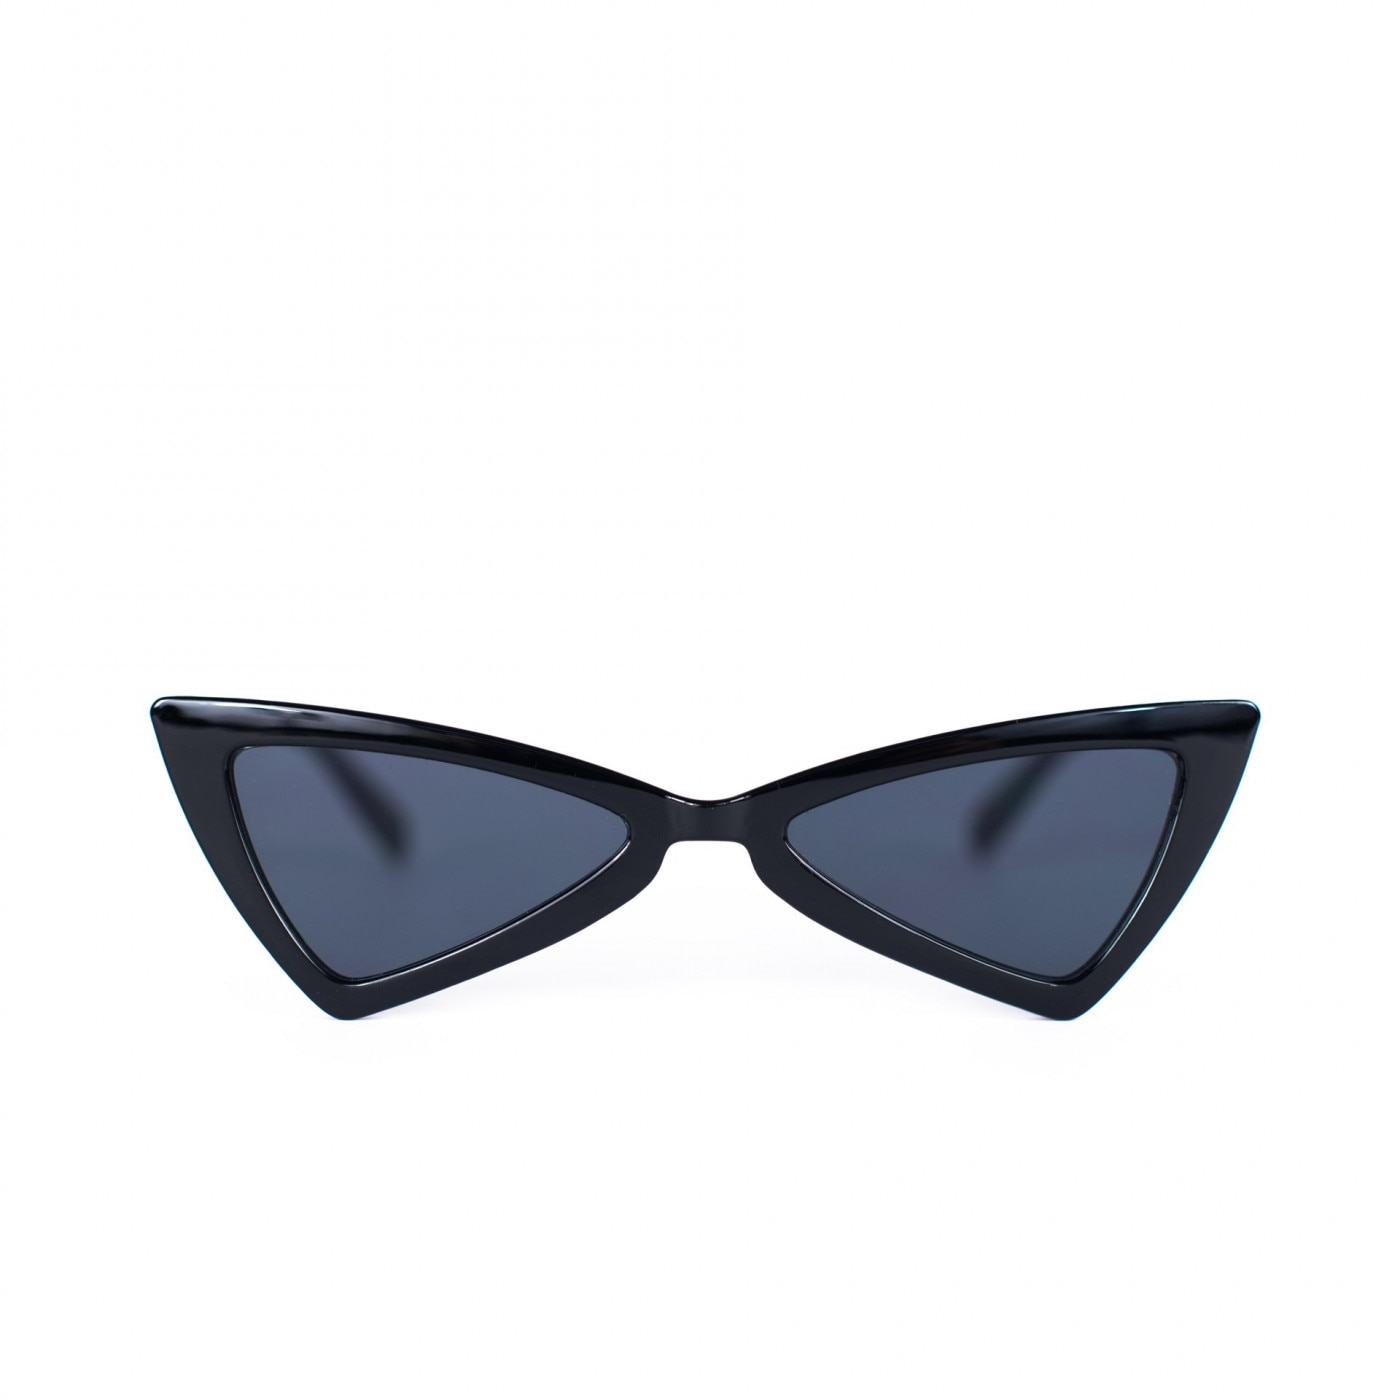 Art Of Polo Woman's Sunglasses ok19204